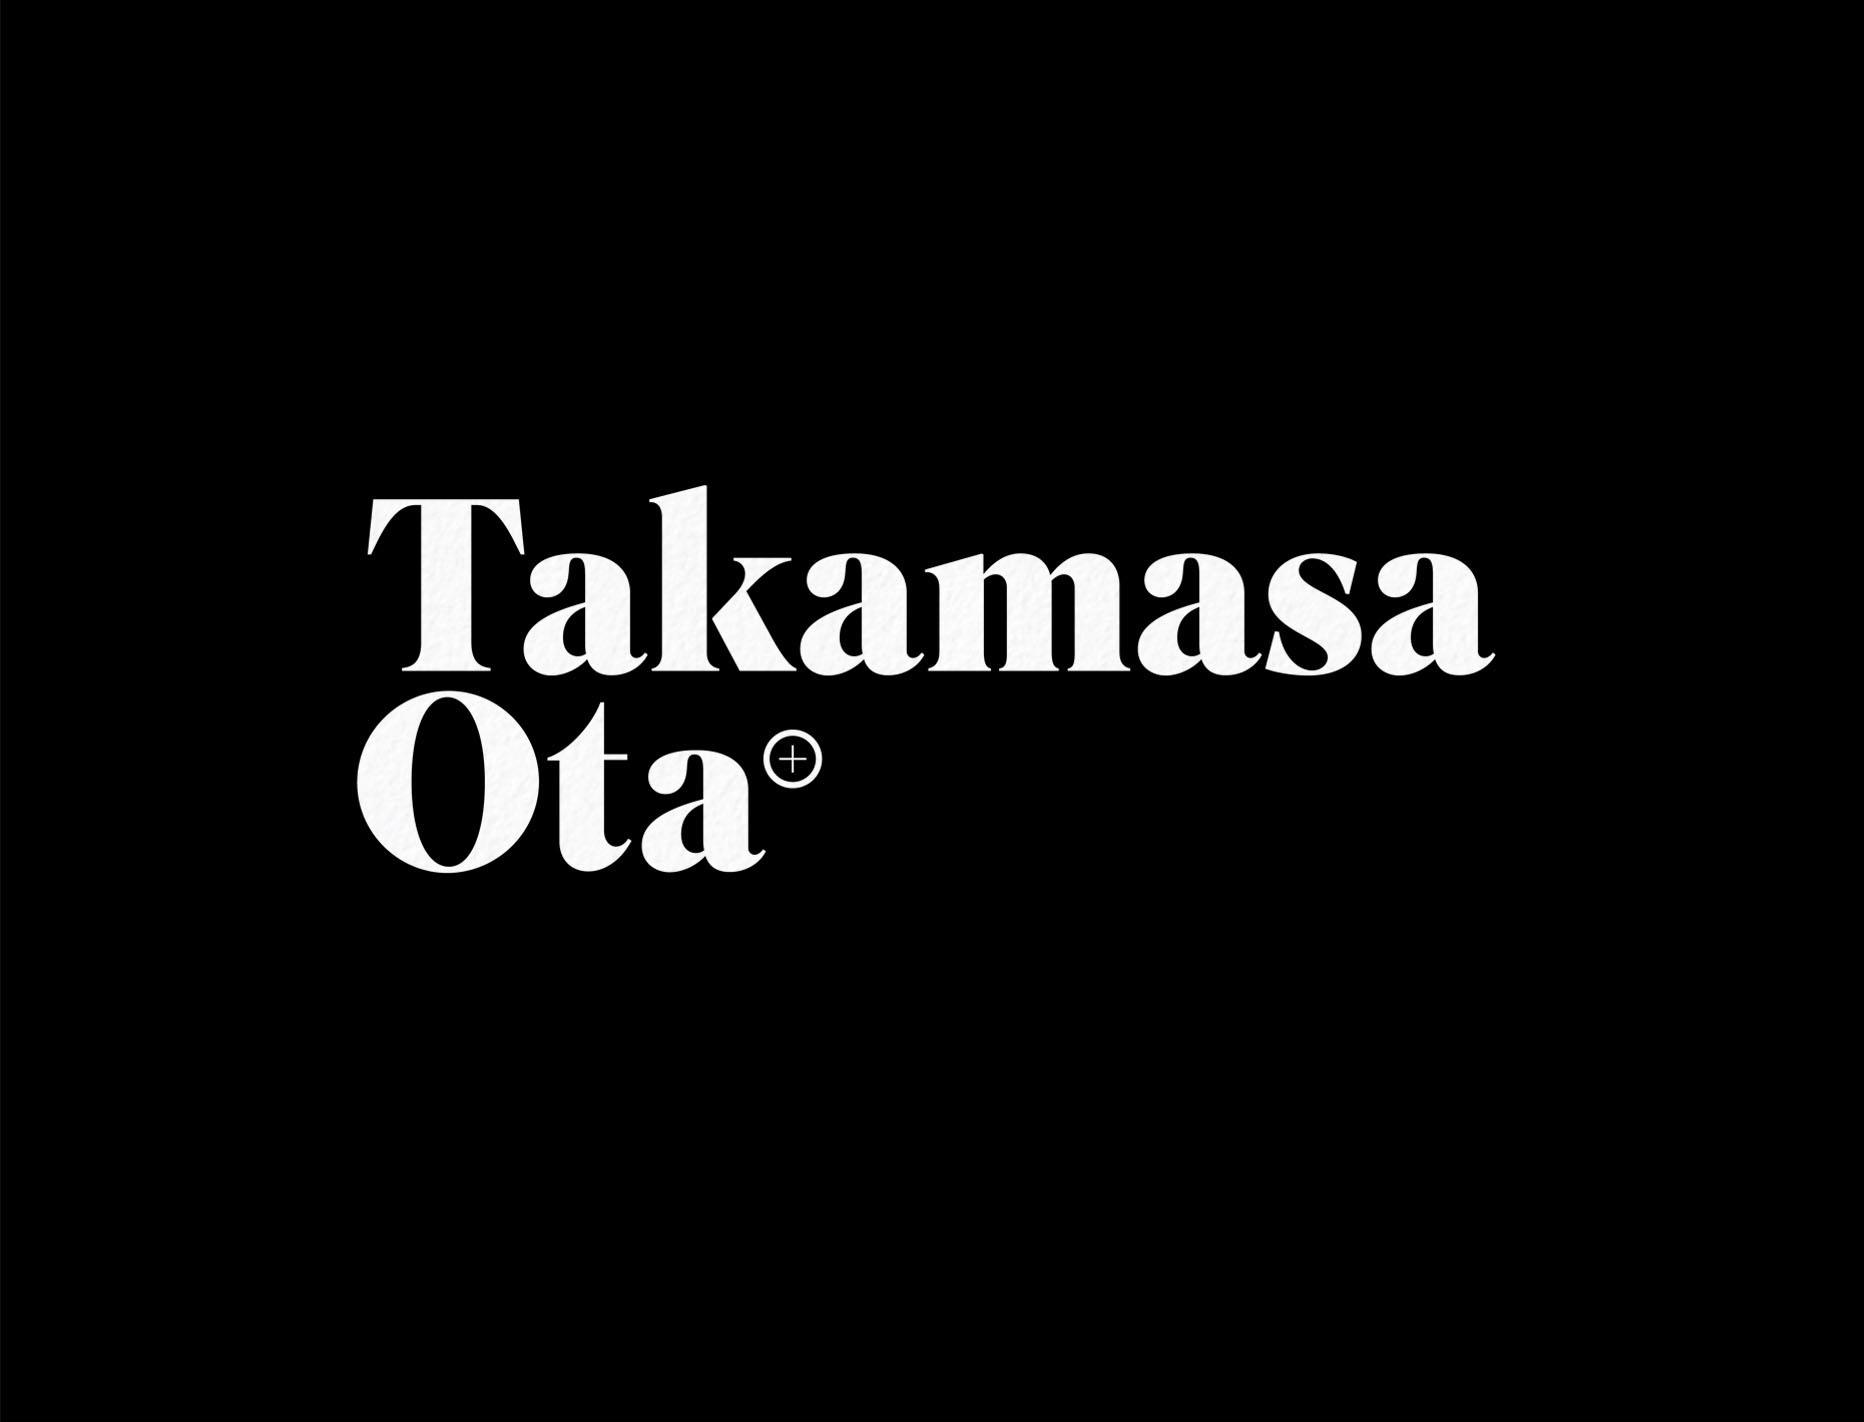 TogtherWeCreate_TakamasaOta_Logo_932.jpg